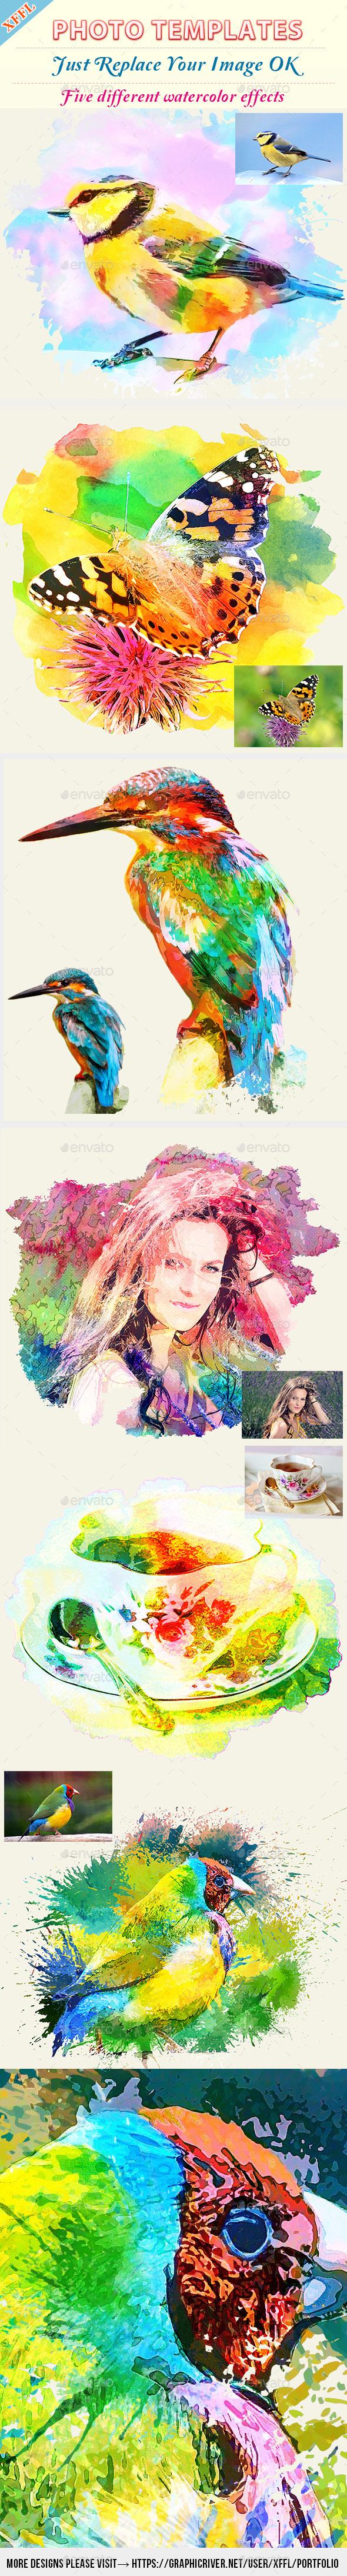 Watercolor Art Photo Template